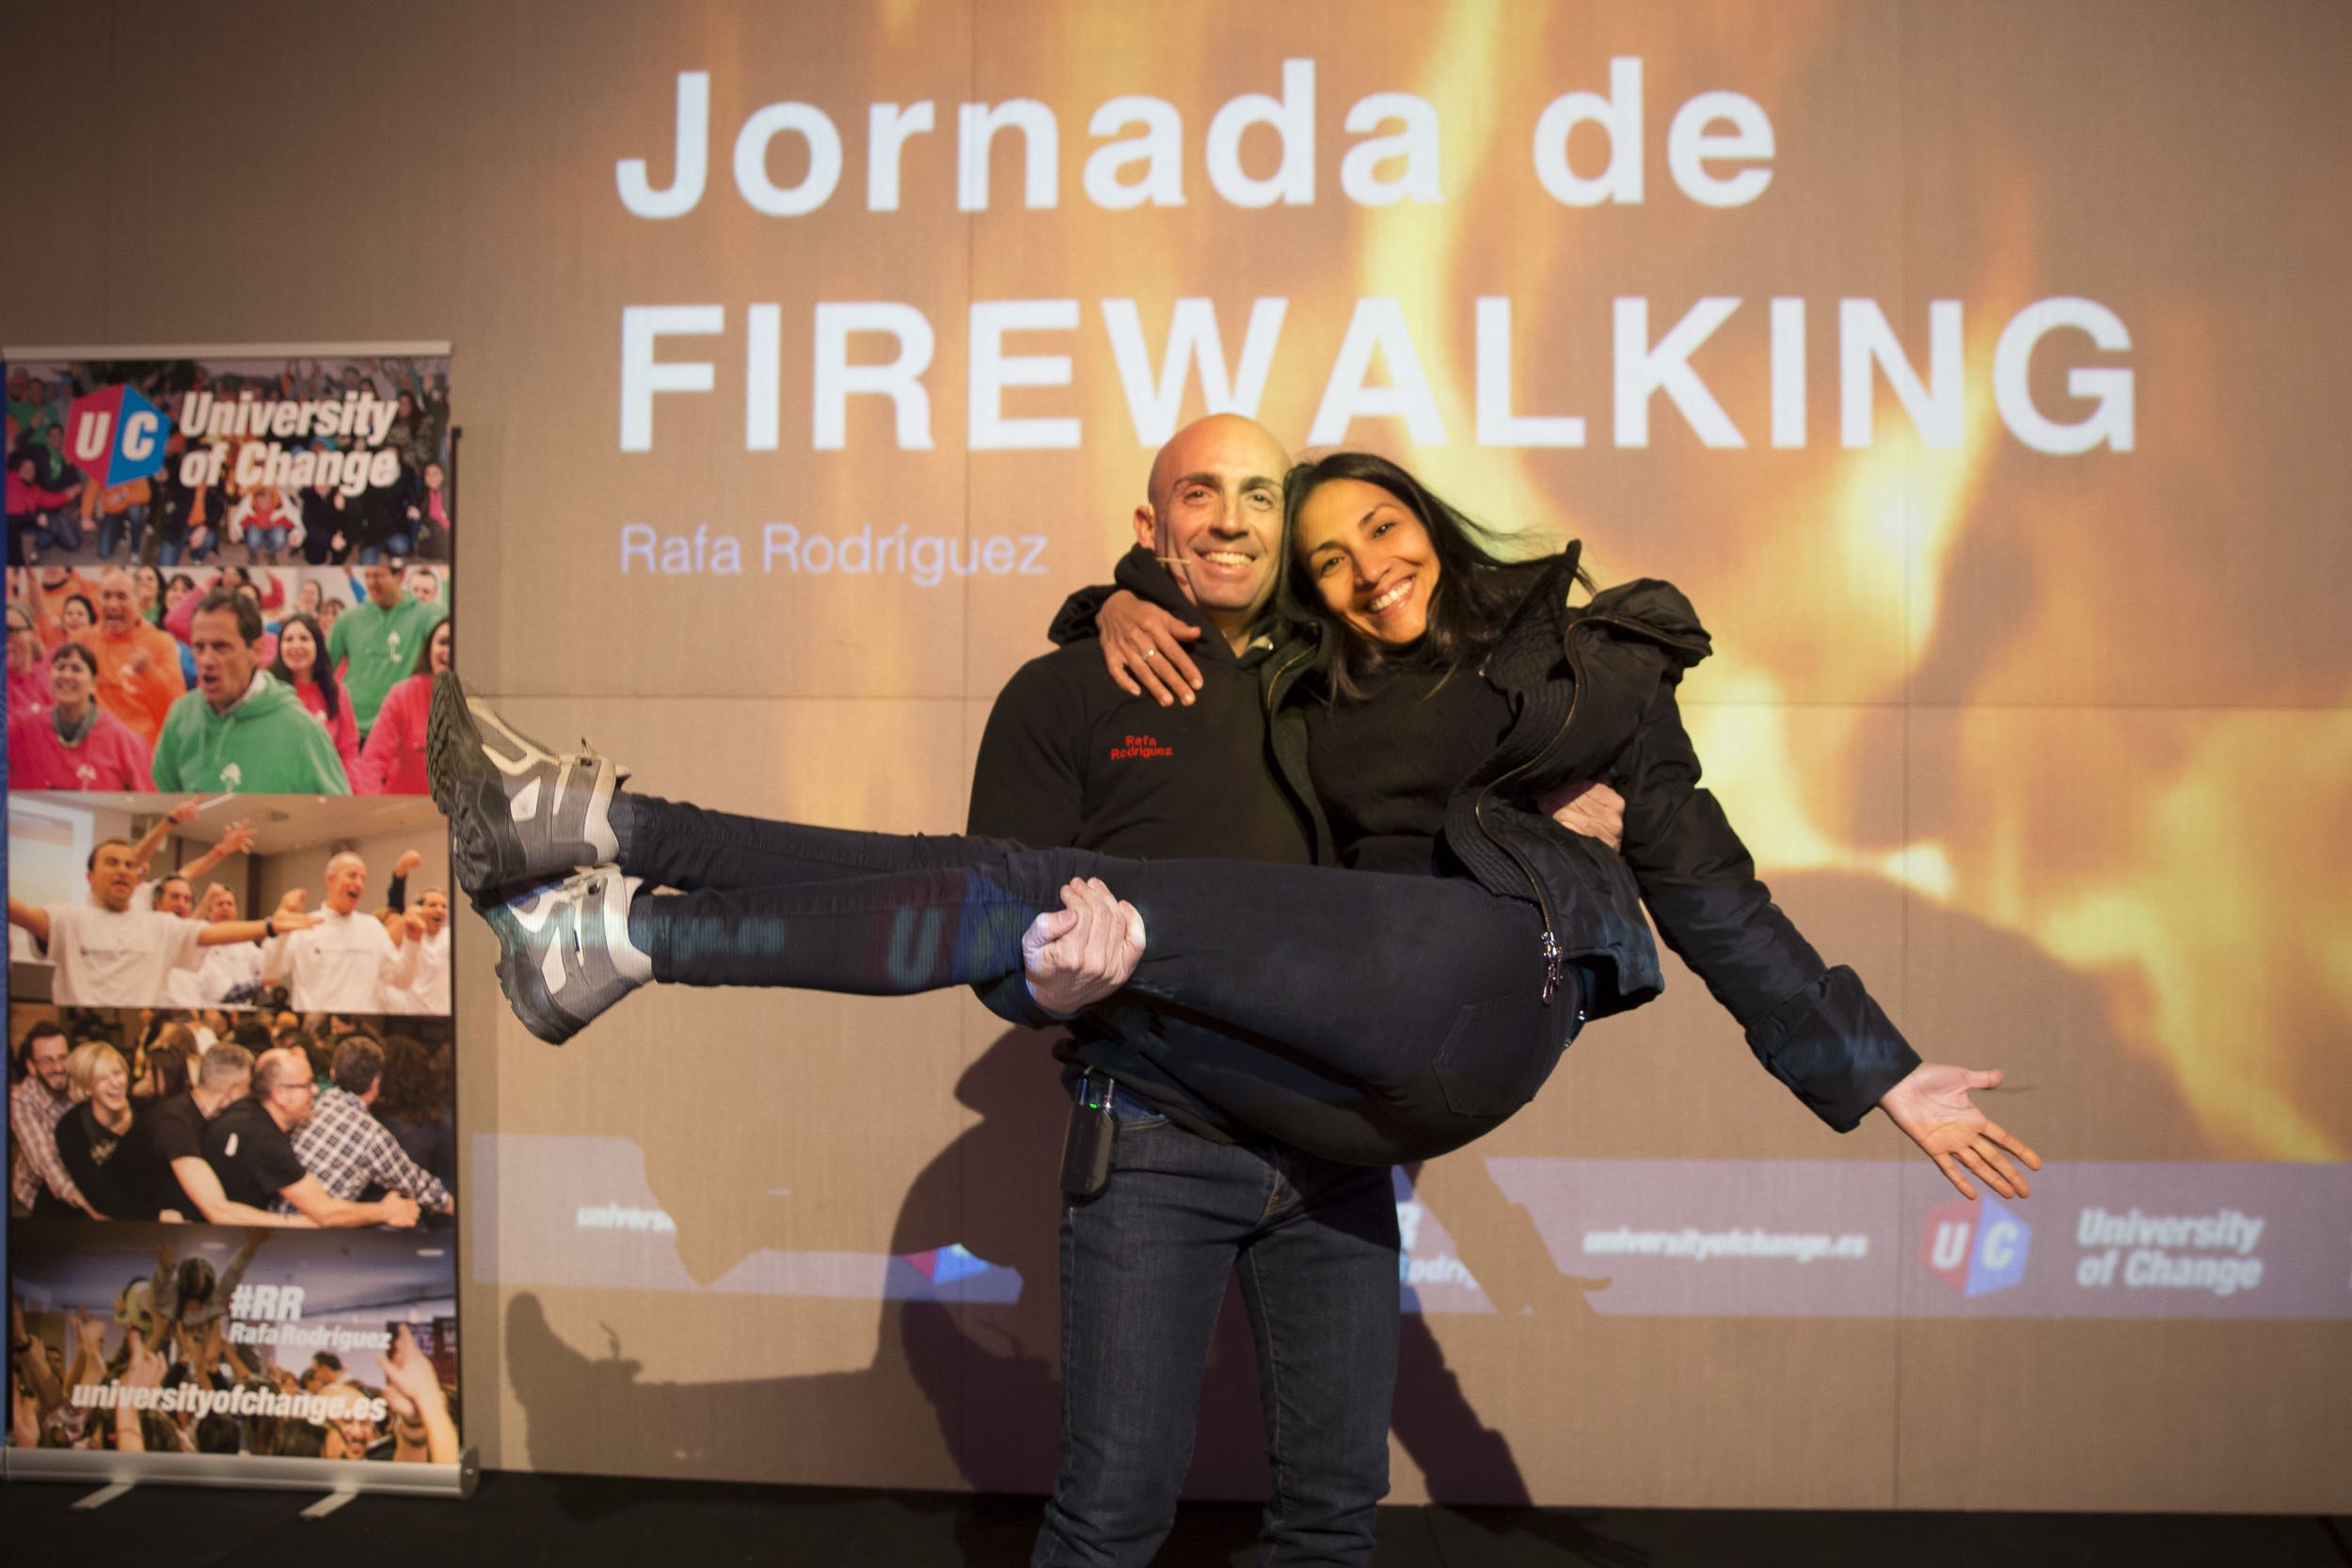 Rafa Rodríguez & Jennifer Moreno